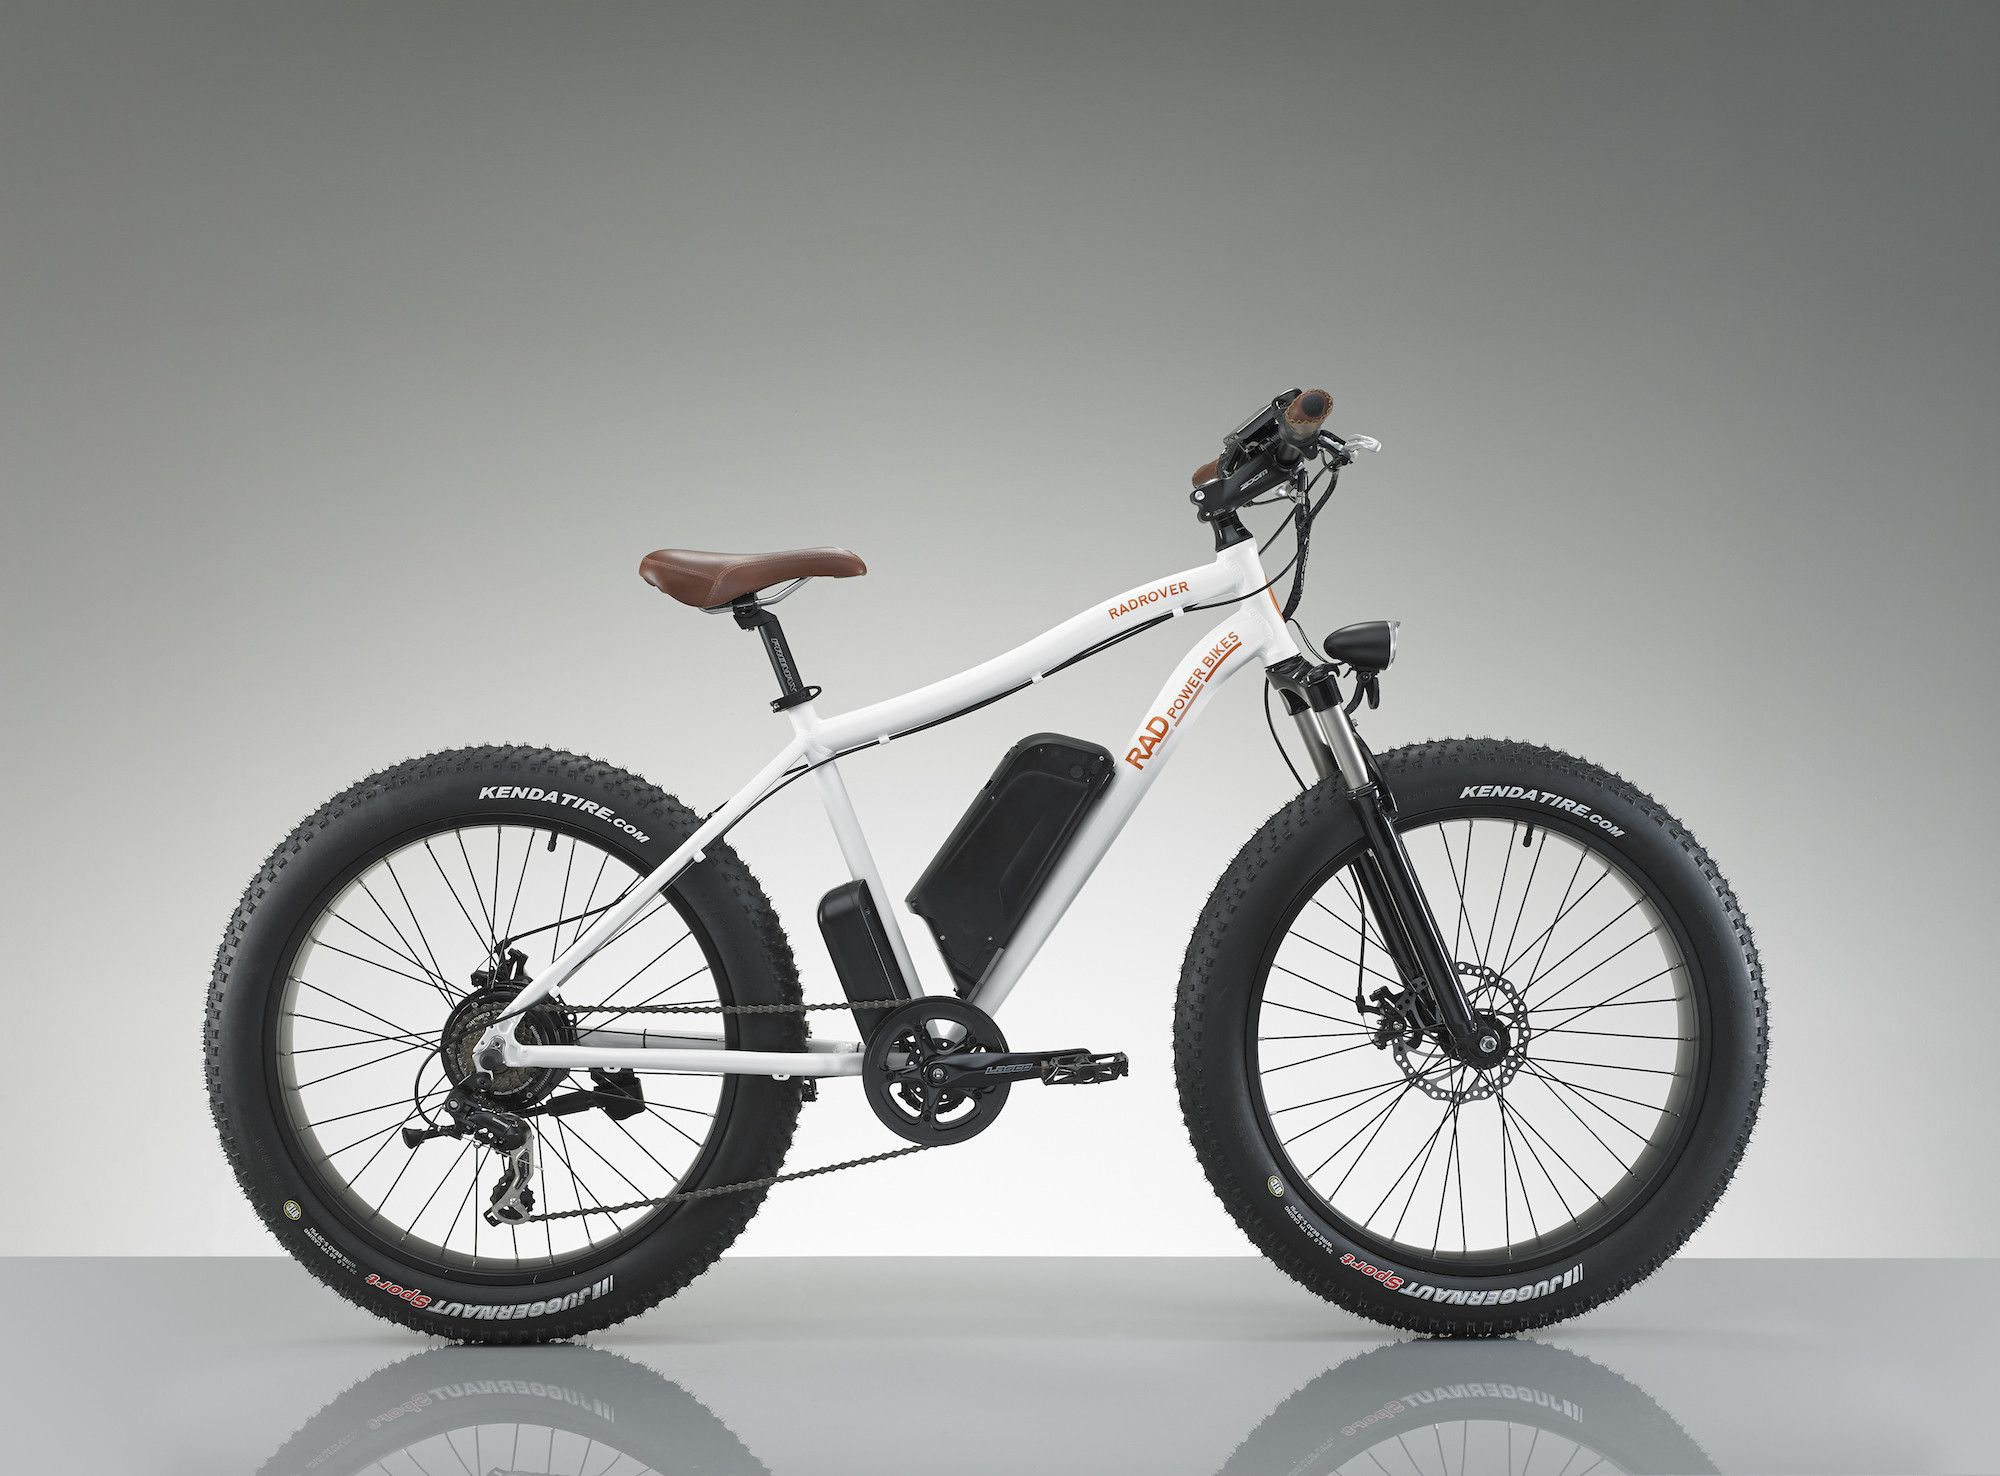 Pin On Adventure Bike